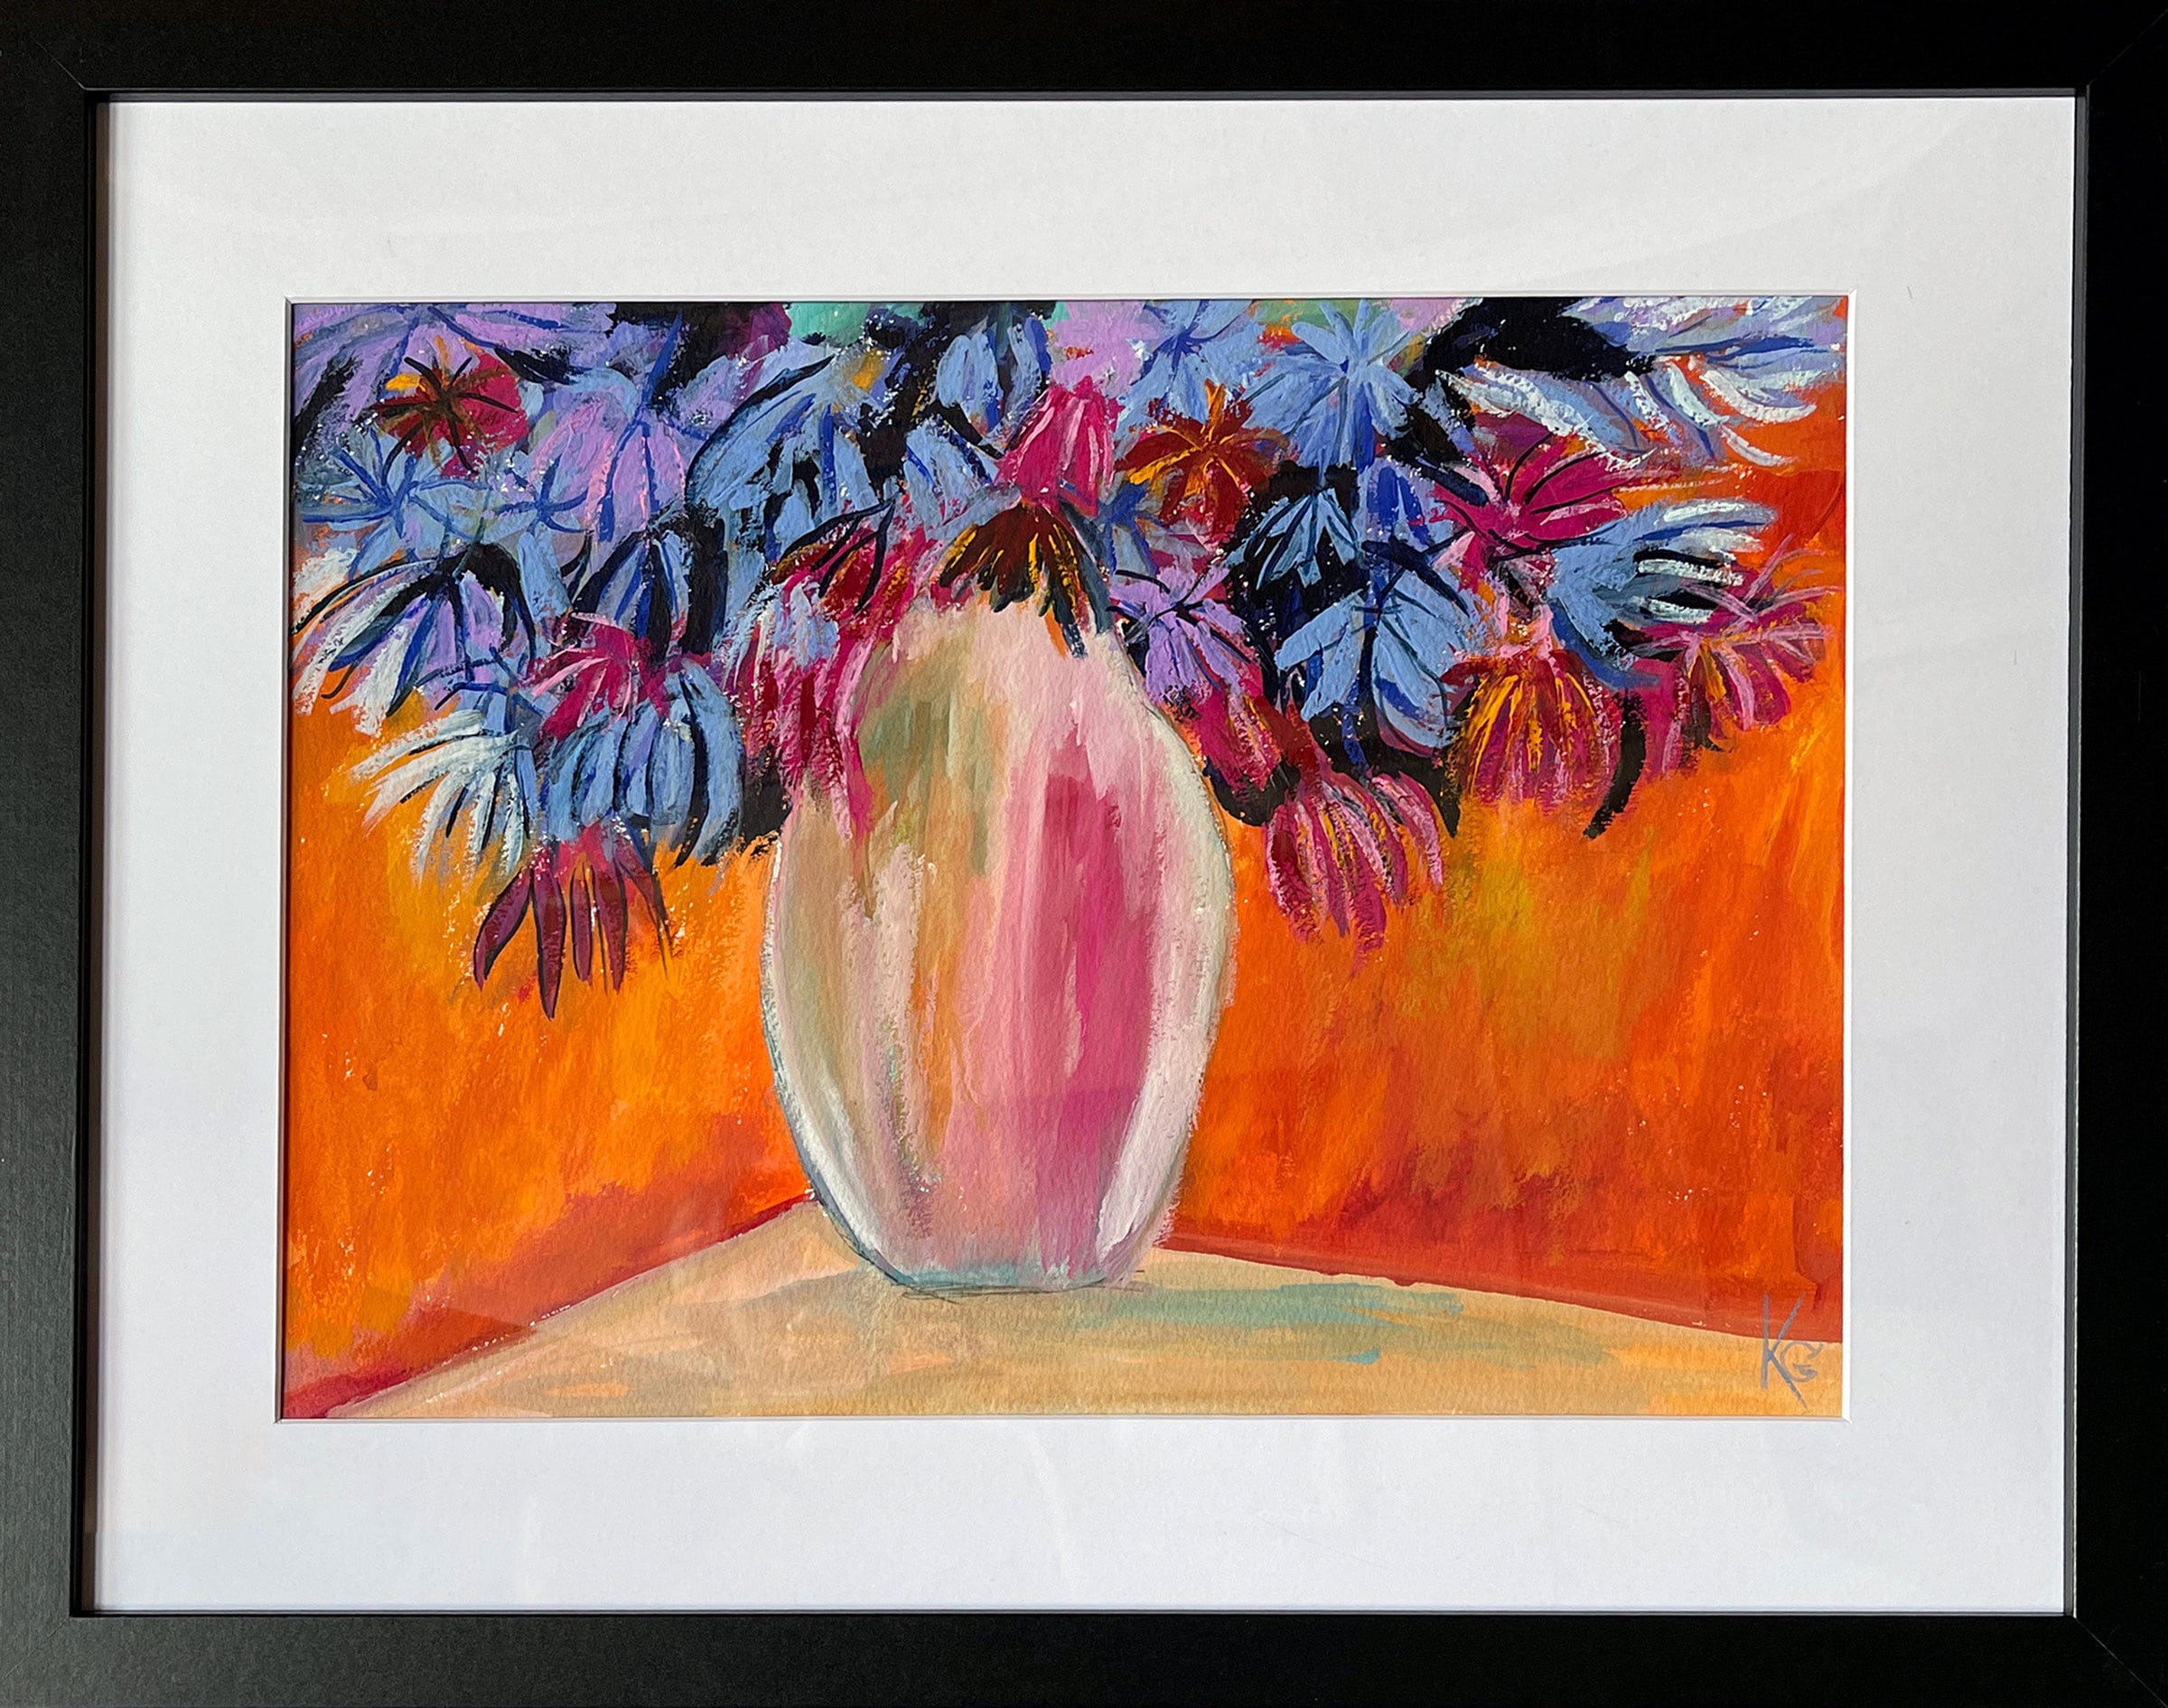 flowers-2985